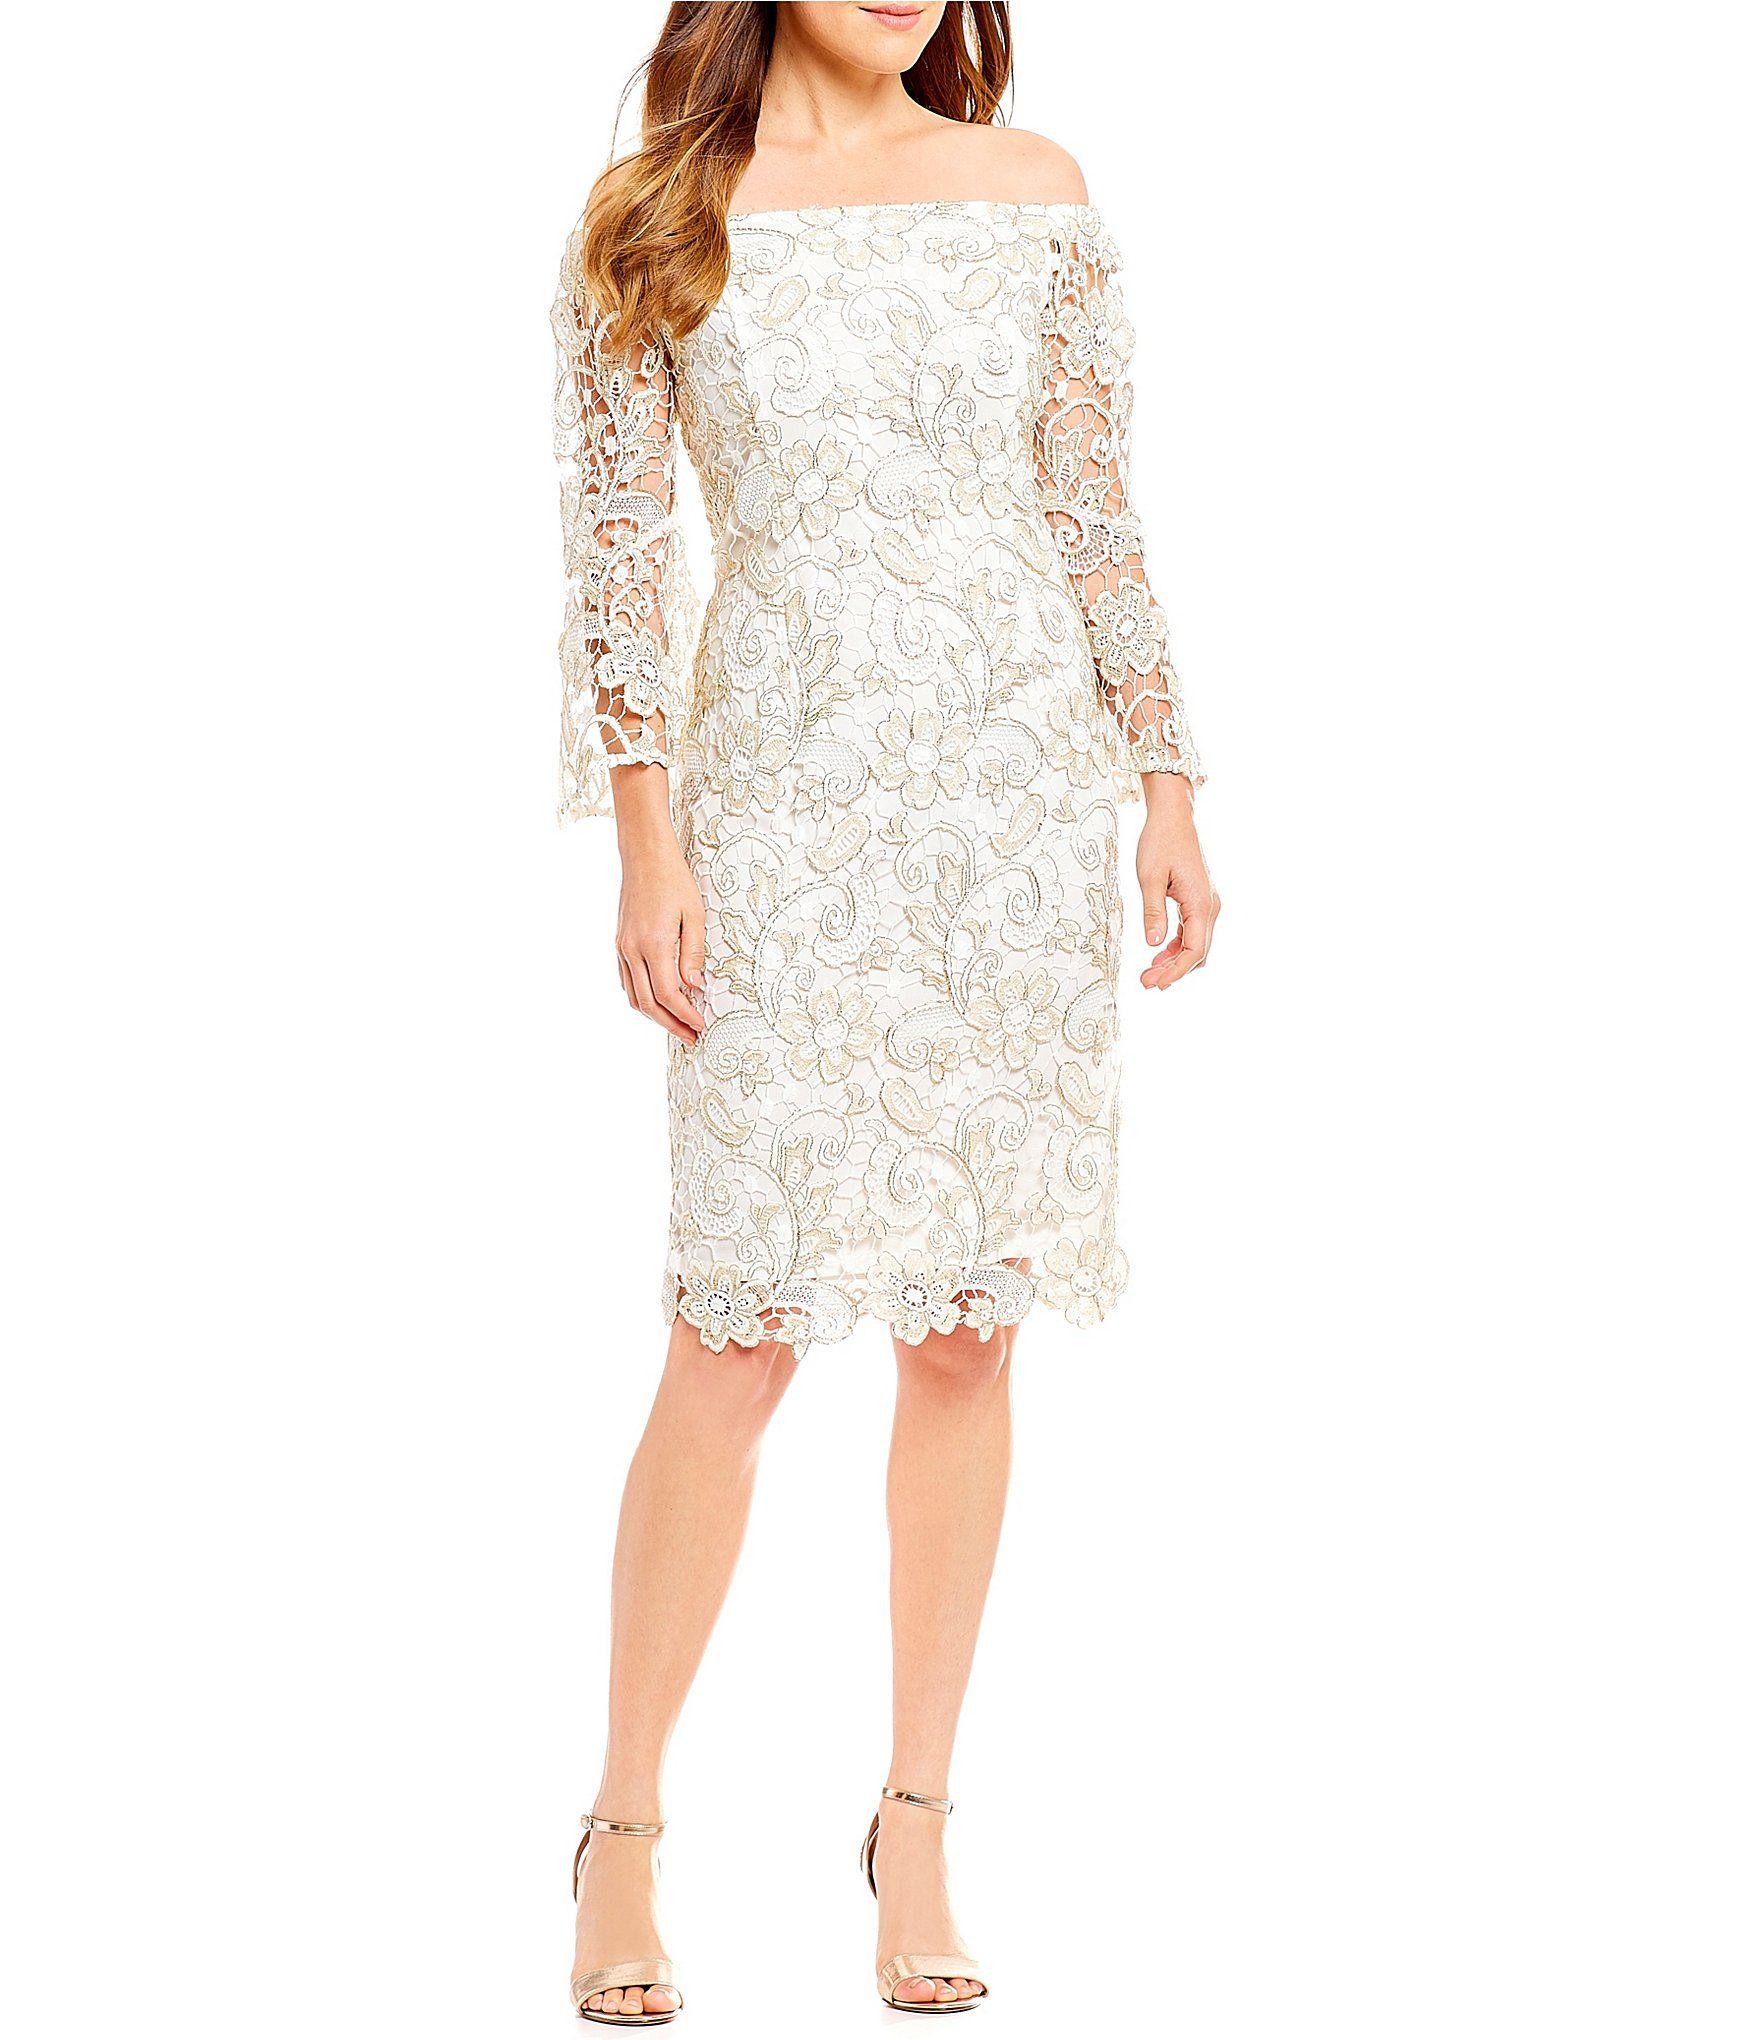 Wedding dresses dillards  Shop for Marina OfftheShoulder Lace Bell Sleeve Dress at Dillards